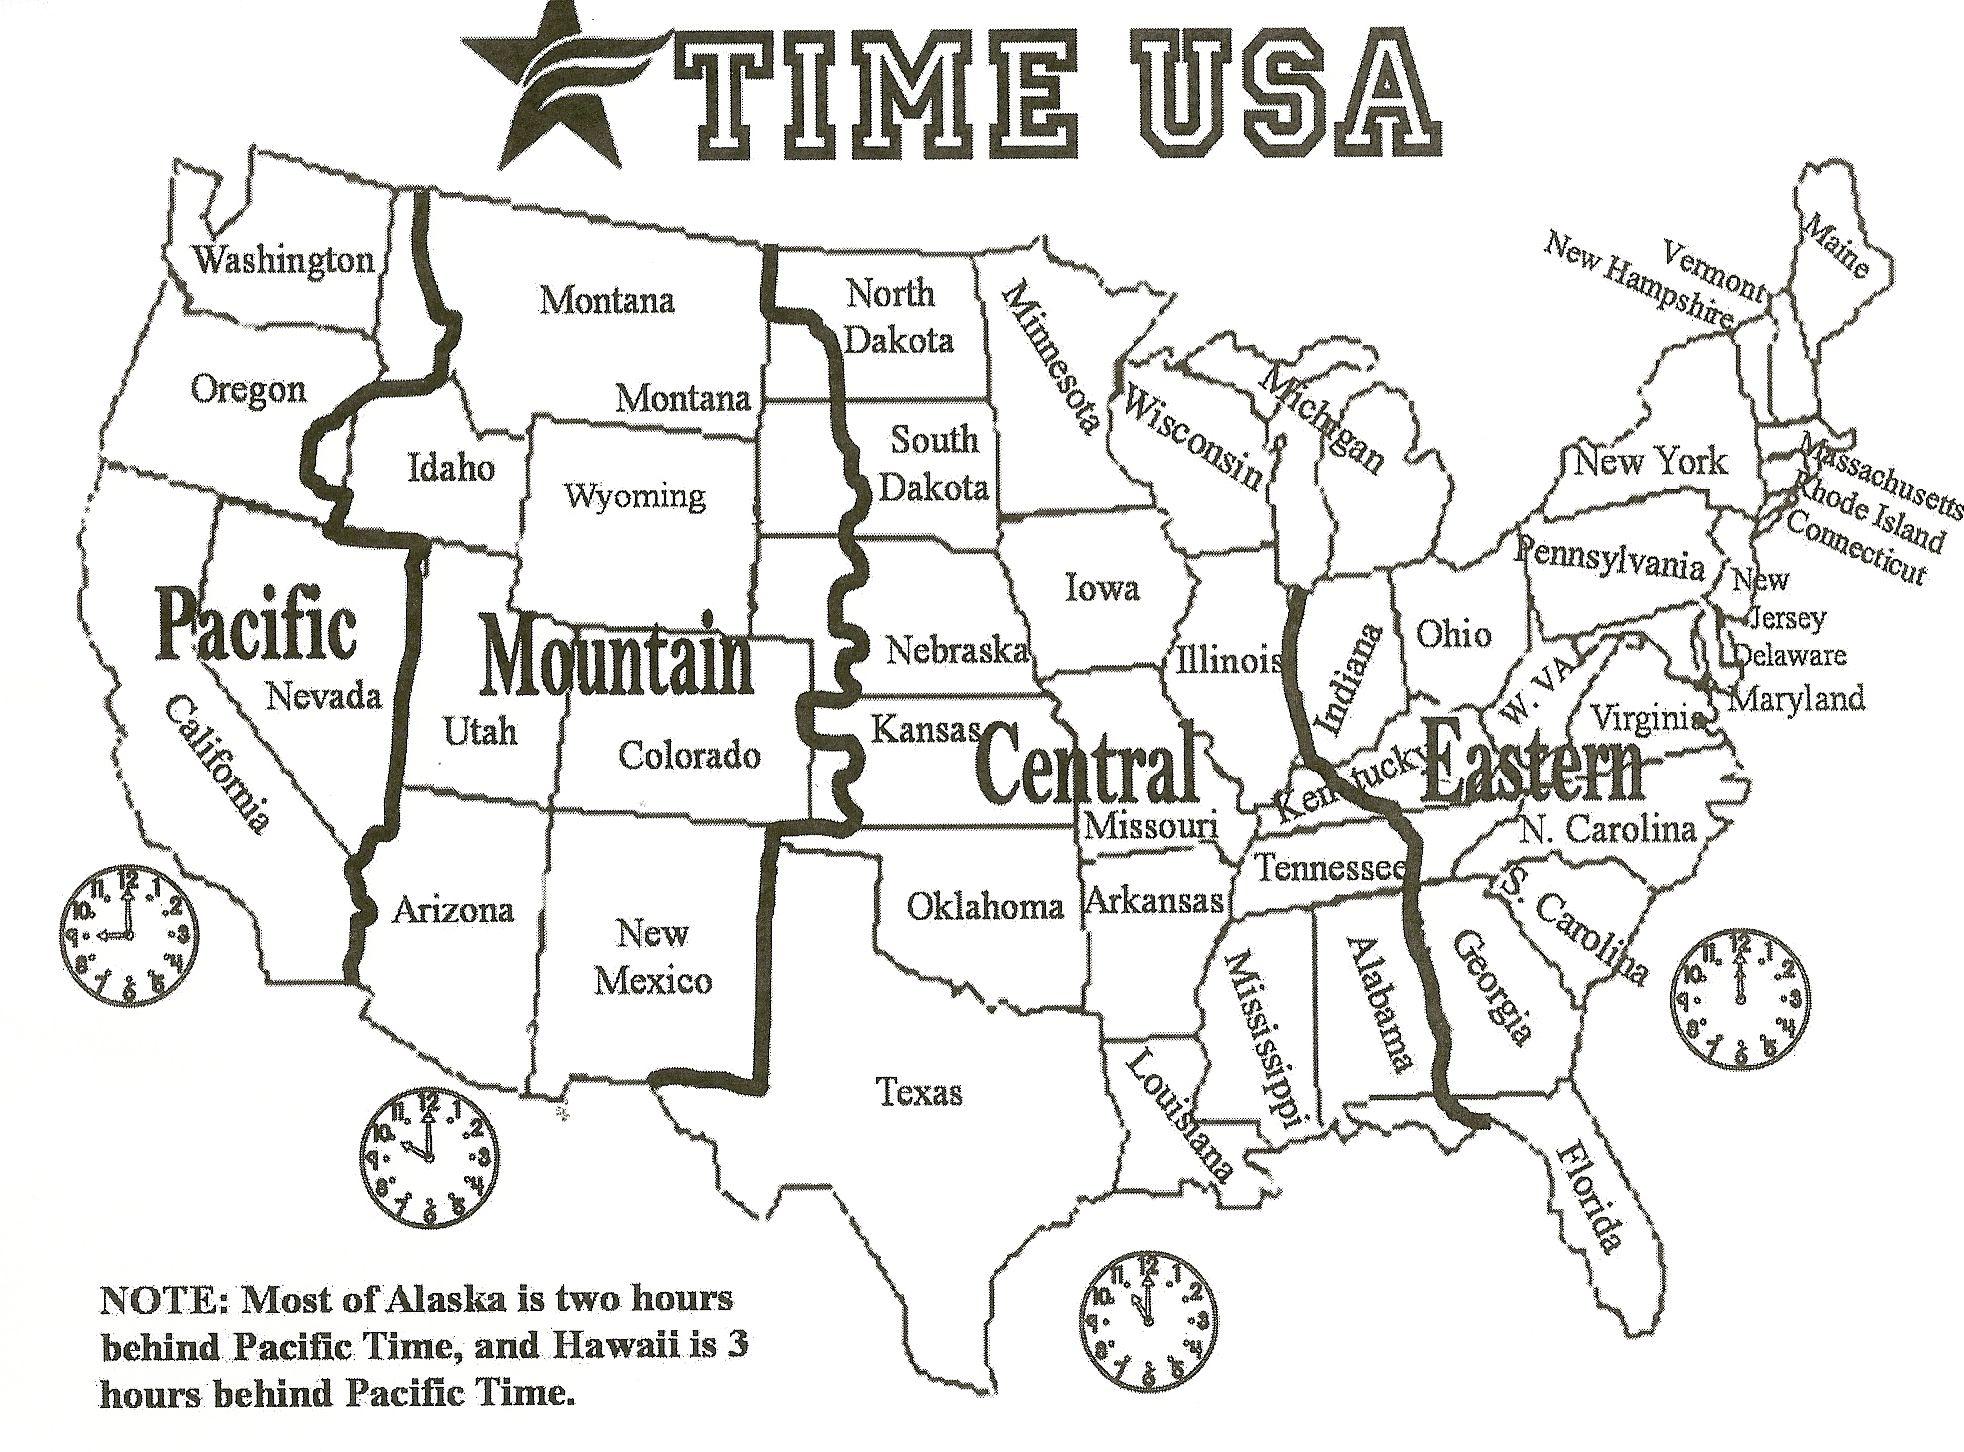 Montana Topographic Map Worksheet